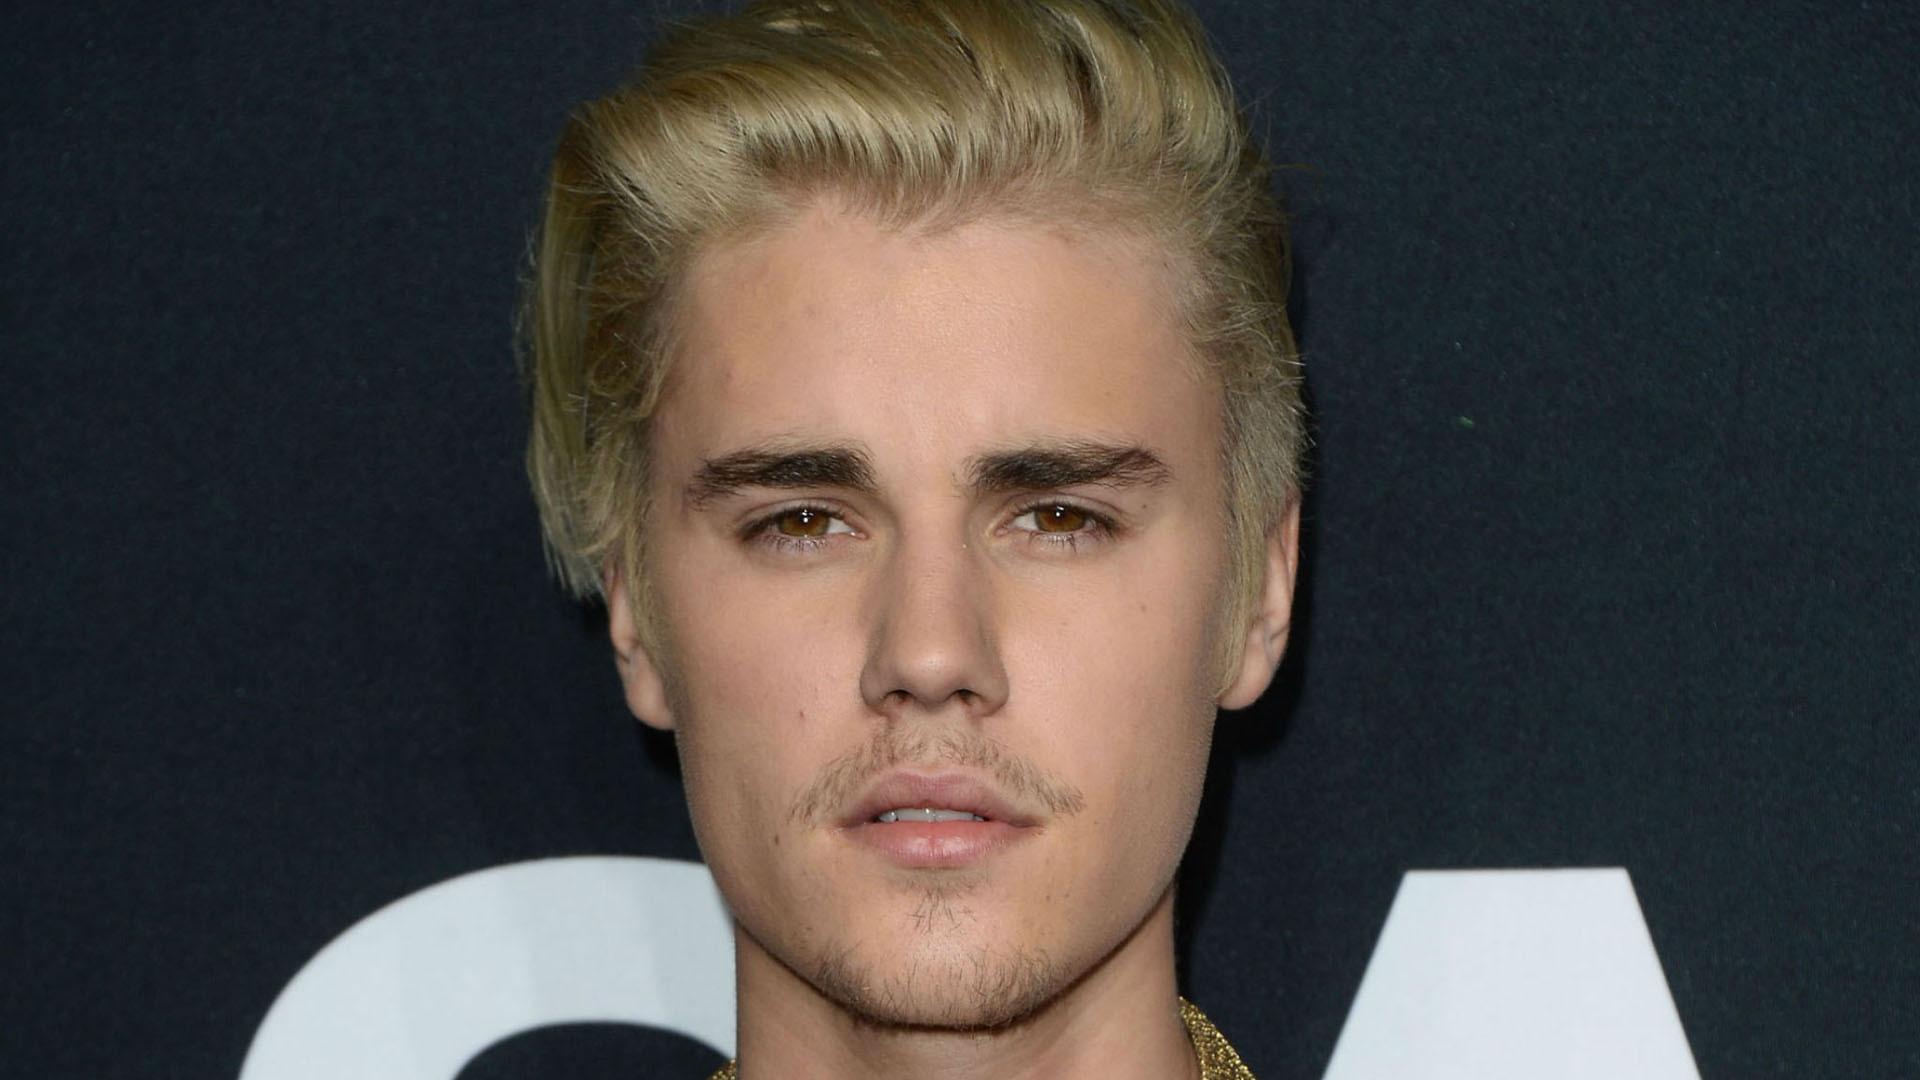 Justin Bieber Wallpaper For Lapto